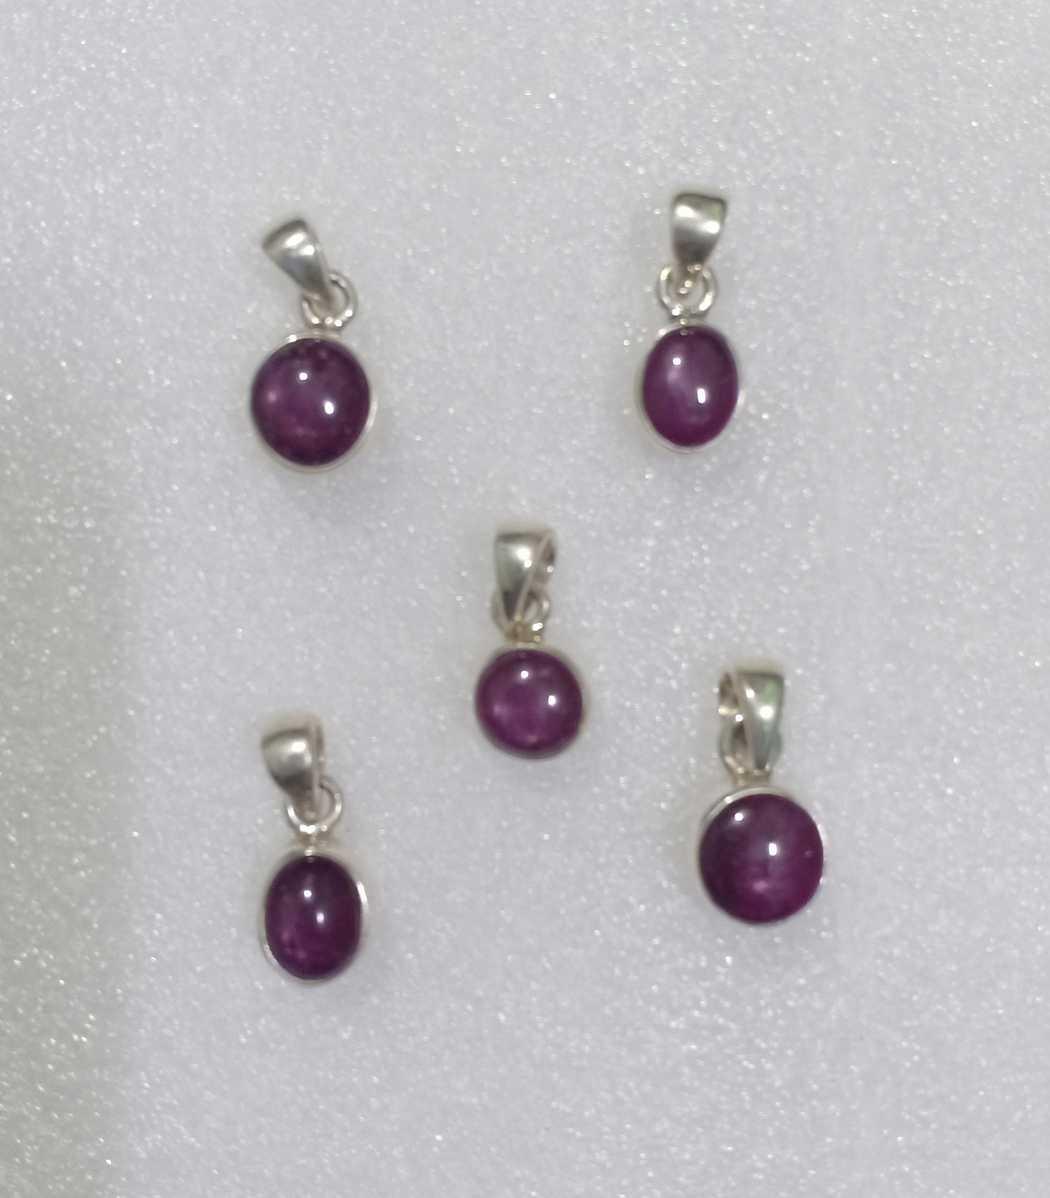 Amethyst pendants